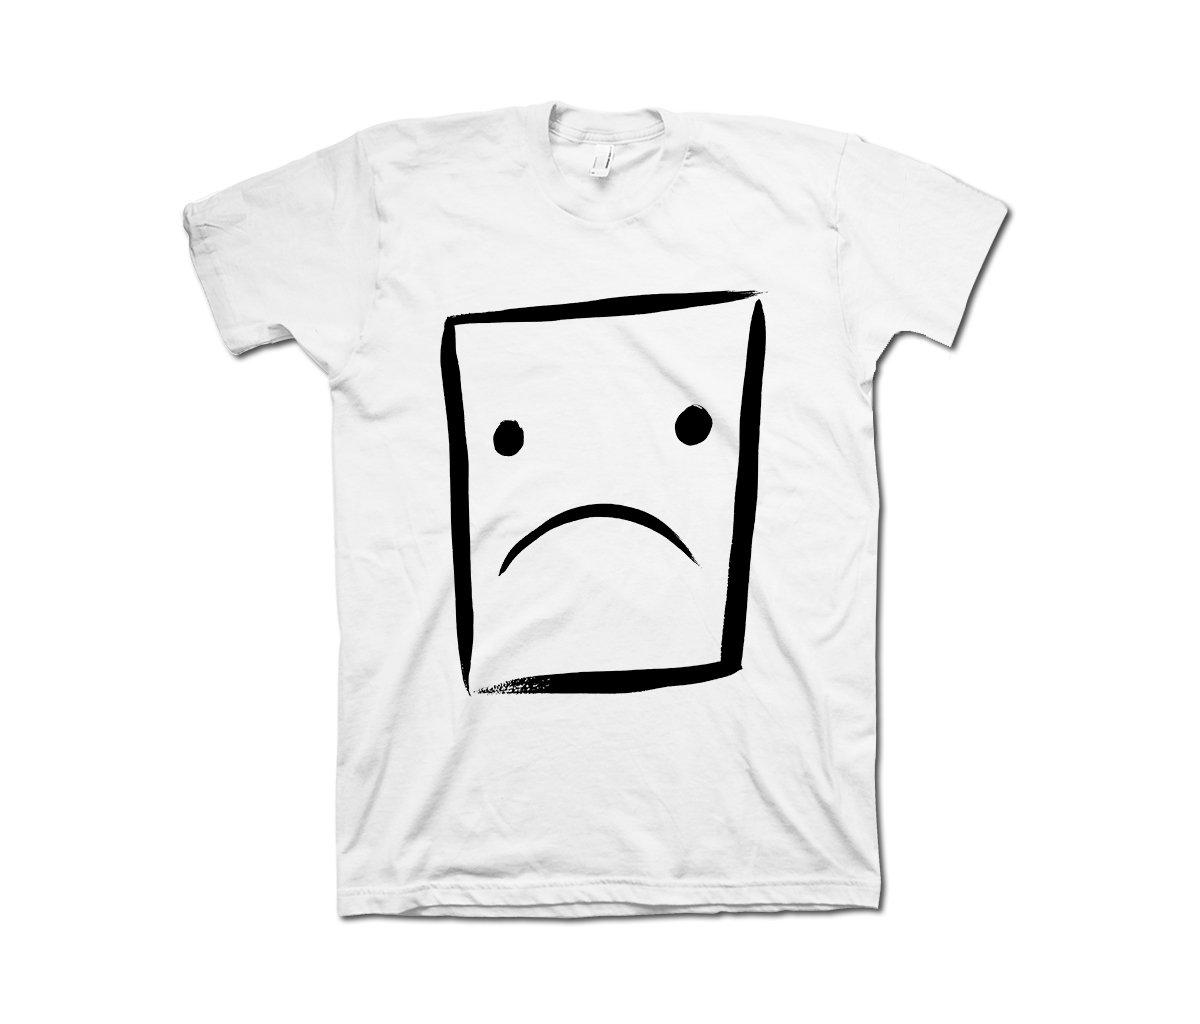 wb-bag-head-shirt-10_2000x.jpg